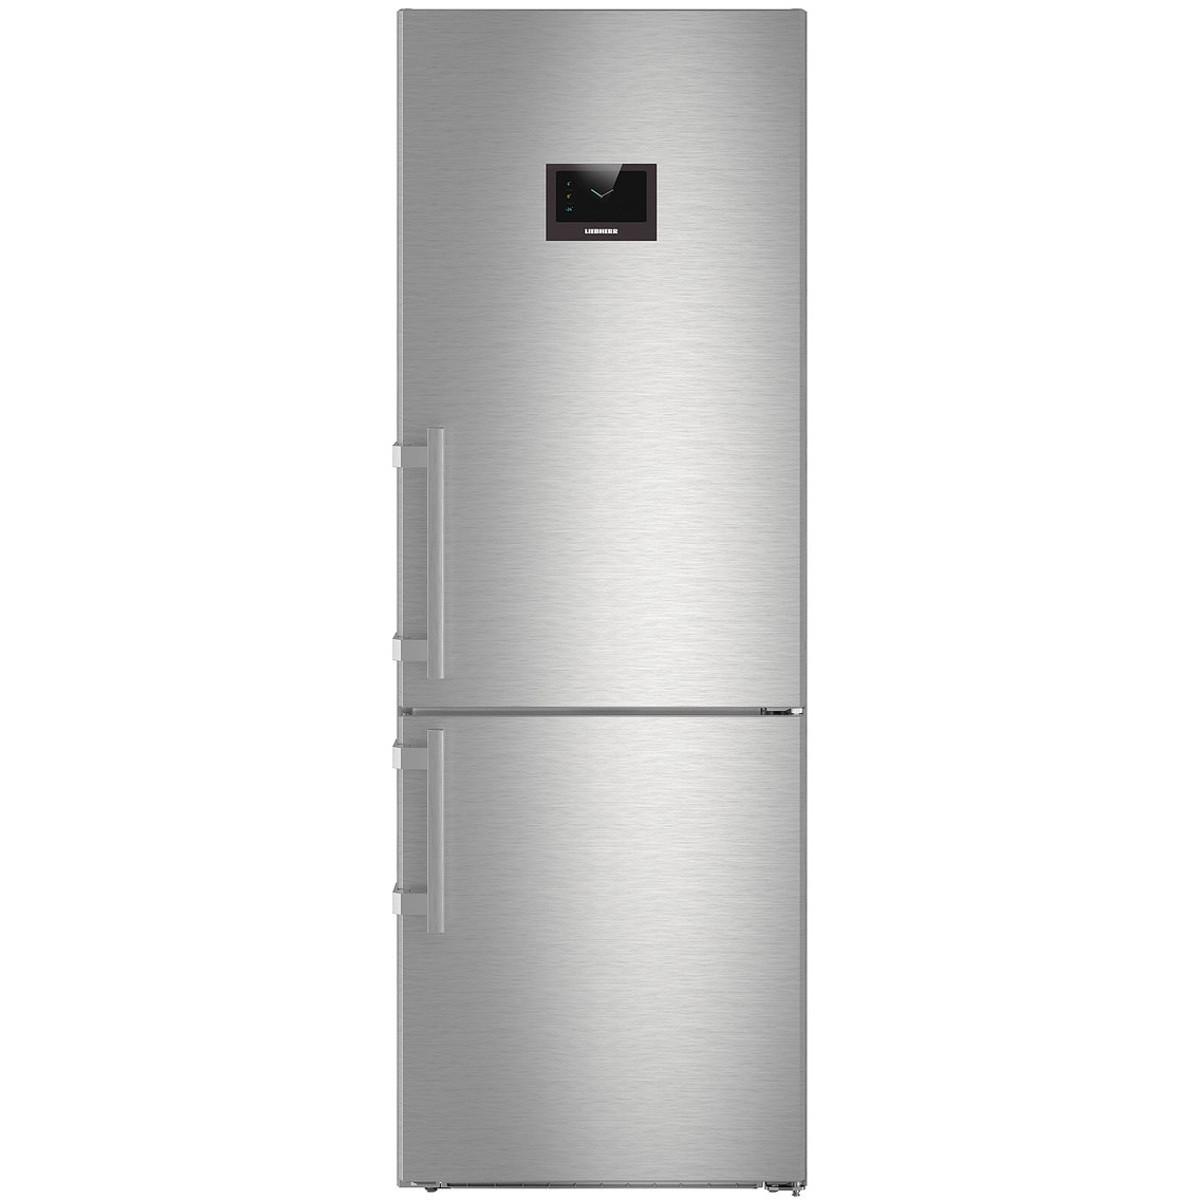 liebherr cbnpes 5758 premium biofresh nofrost fridge. Black Bedroom Furniture Sets. Home Design Ideas